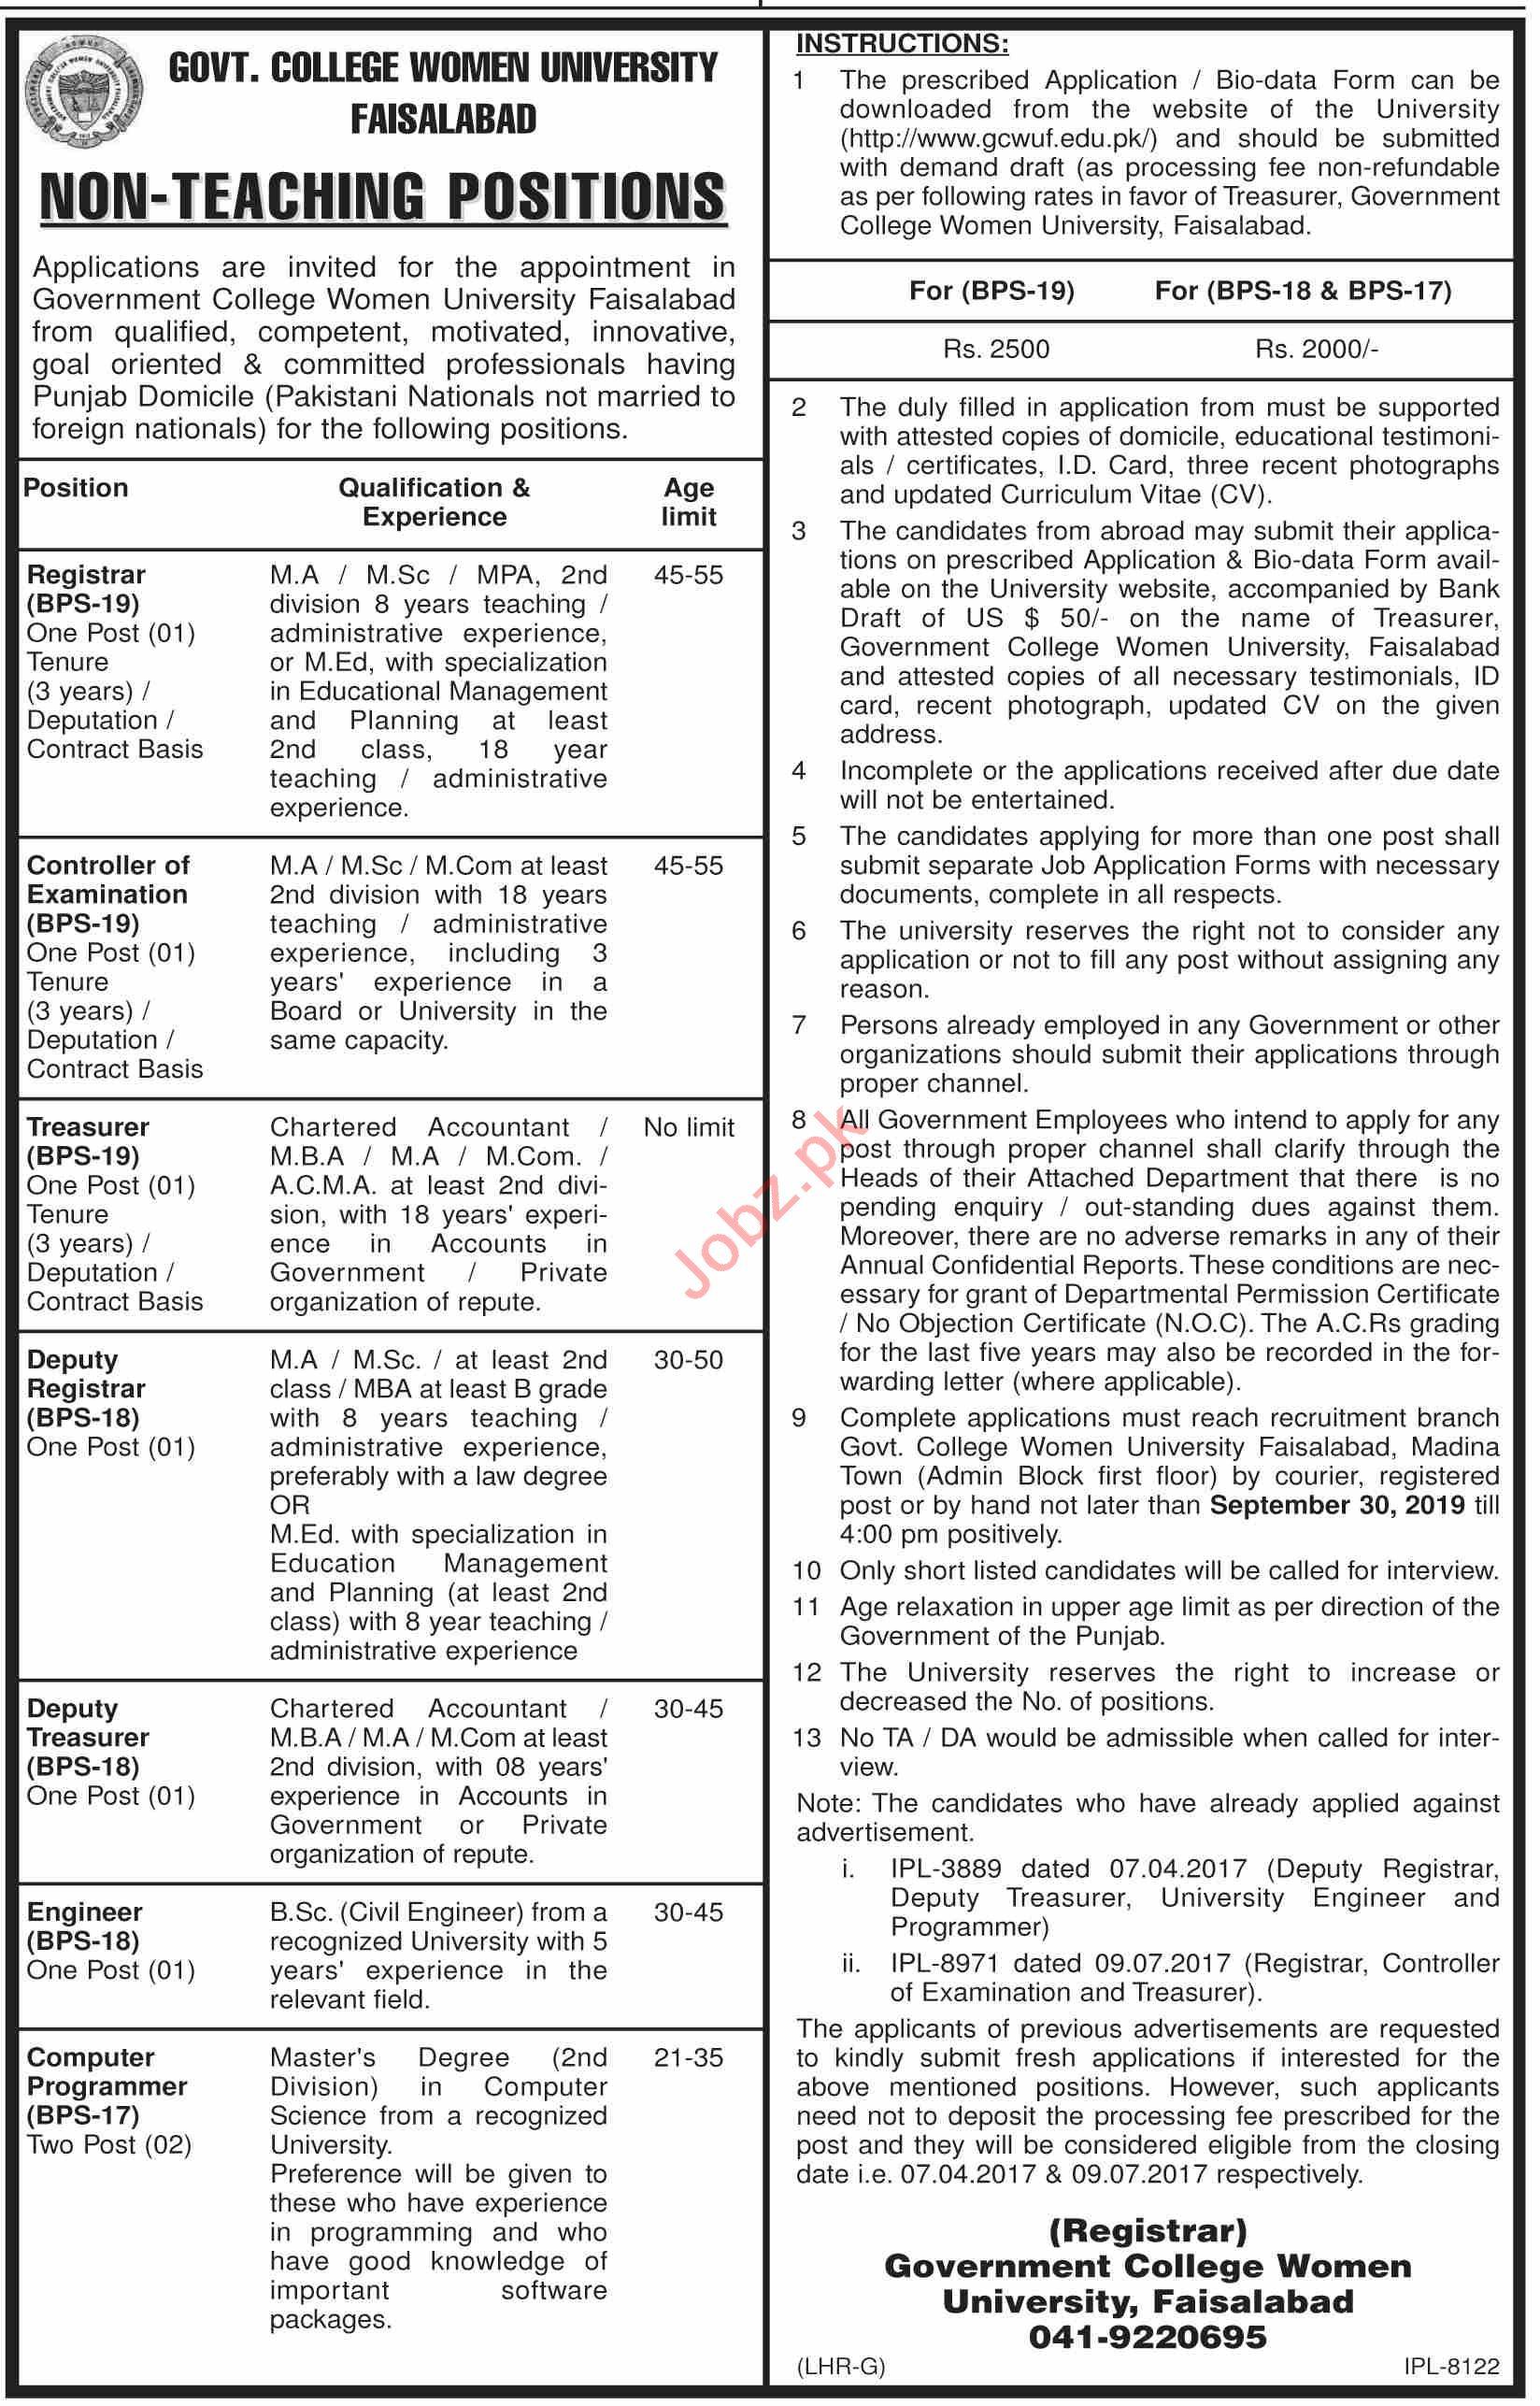 Govt College Women University Faisalabad GCWUF Jobs 2019